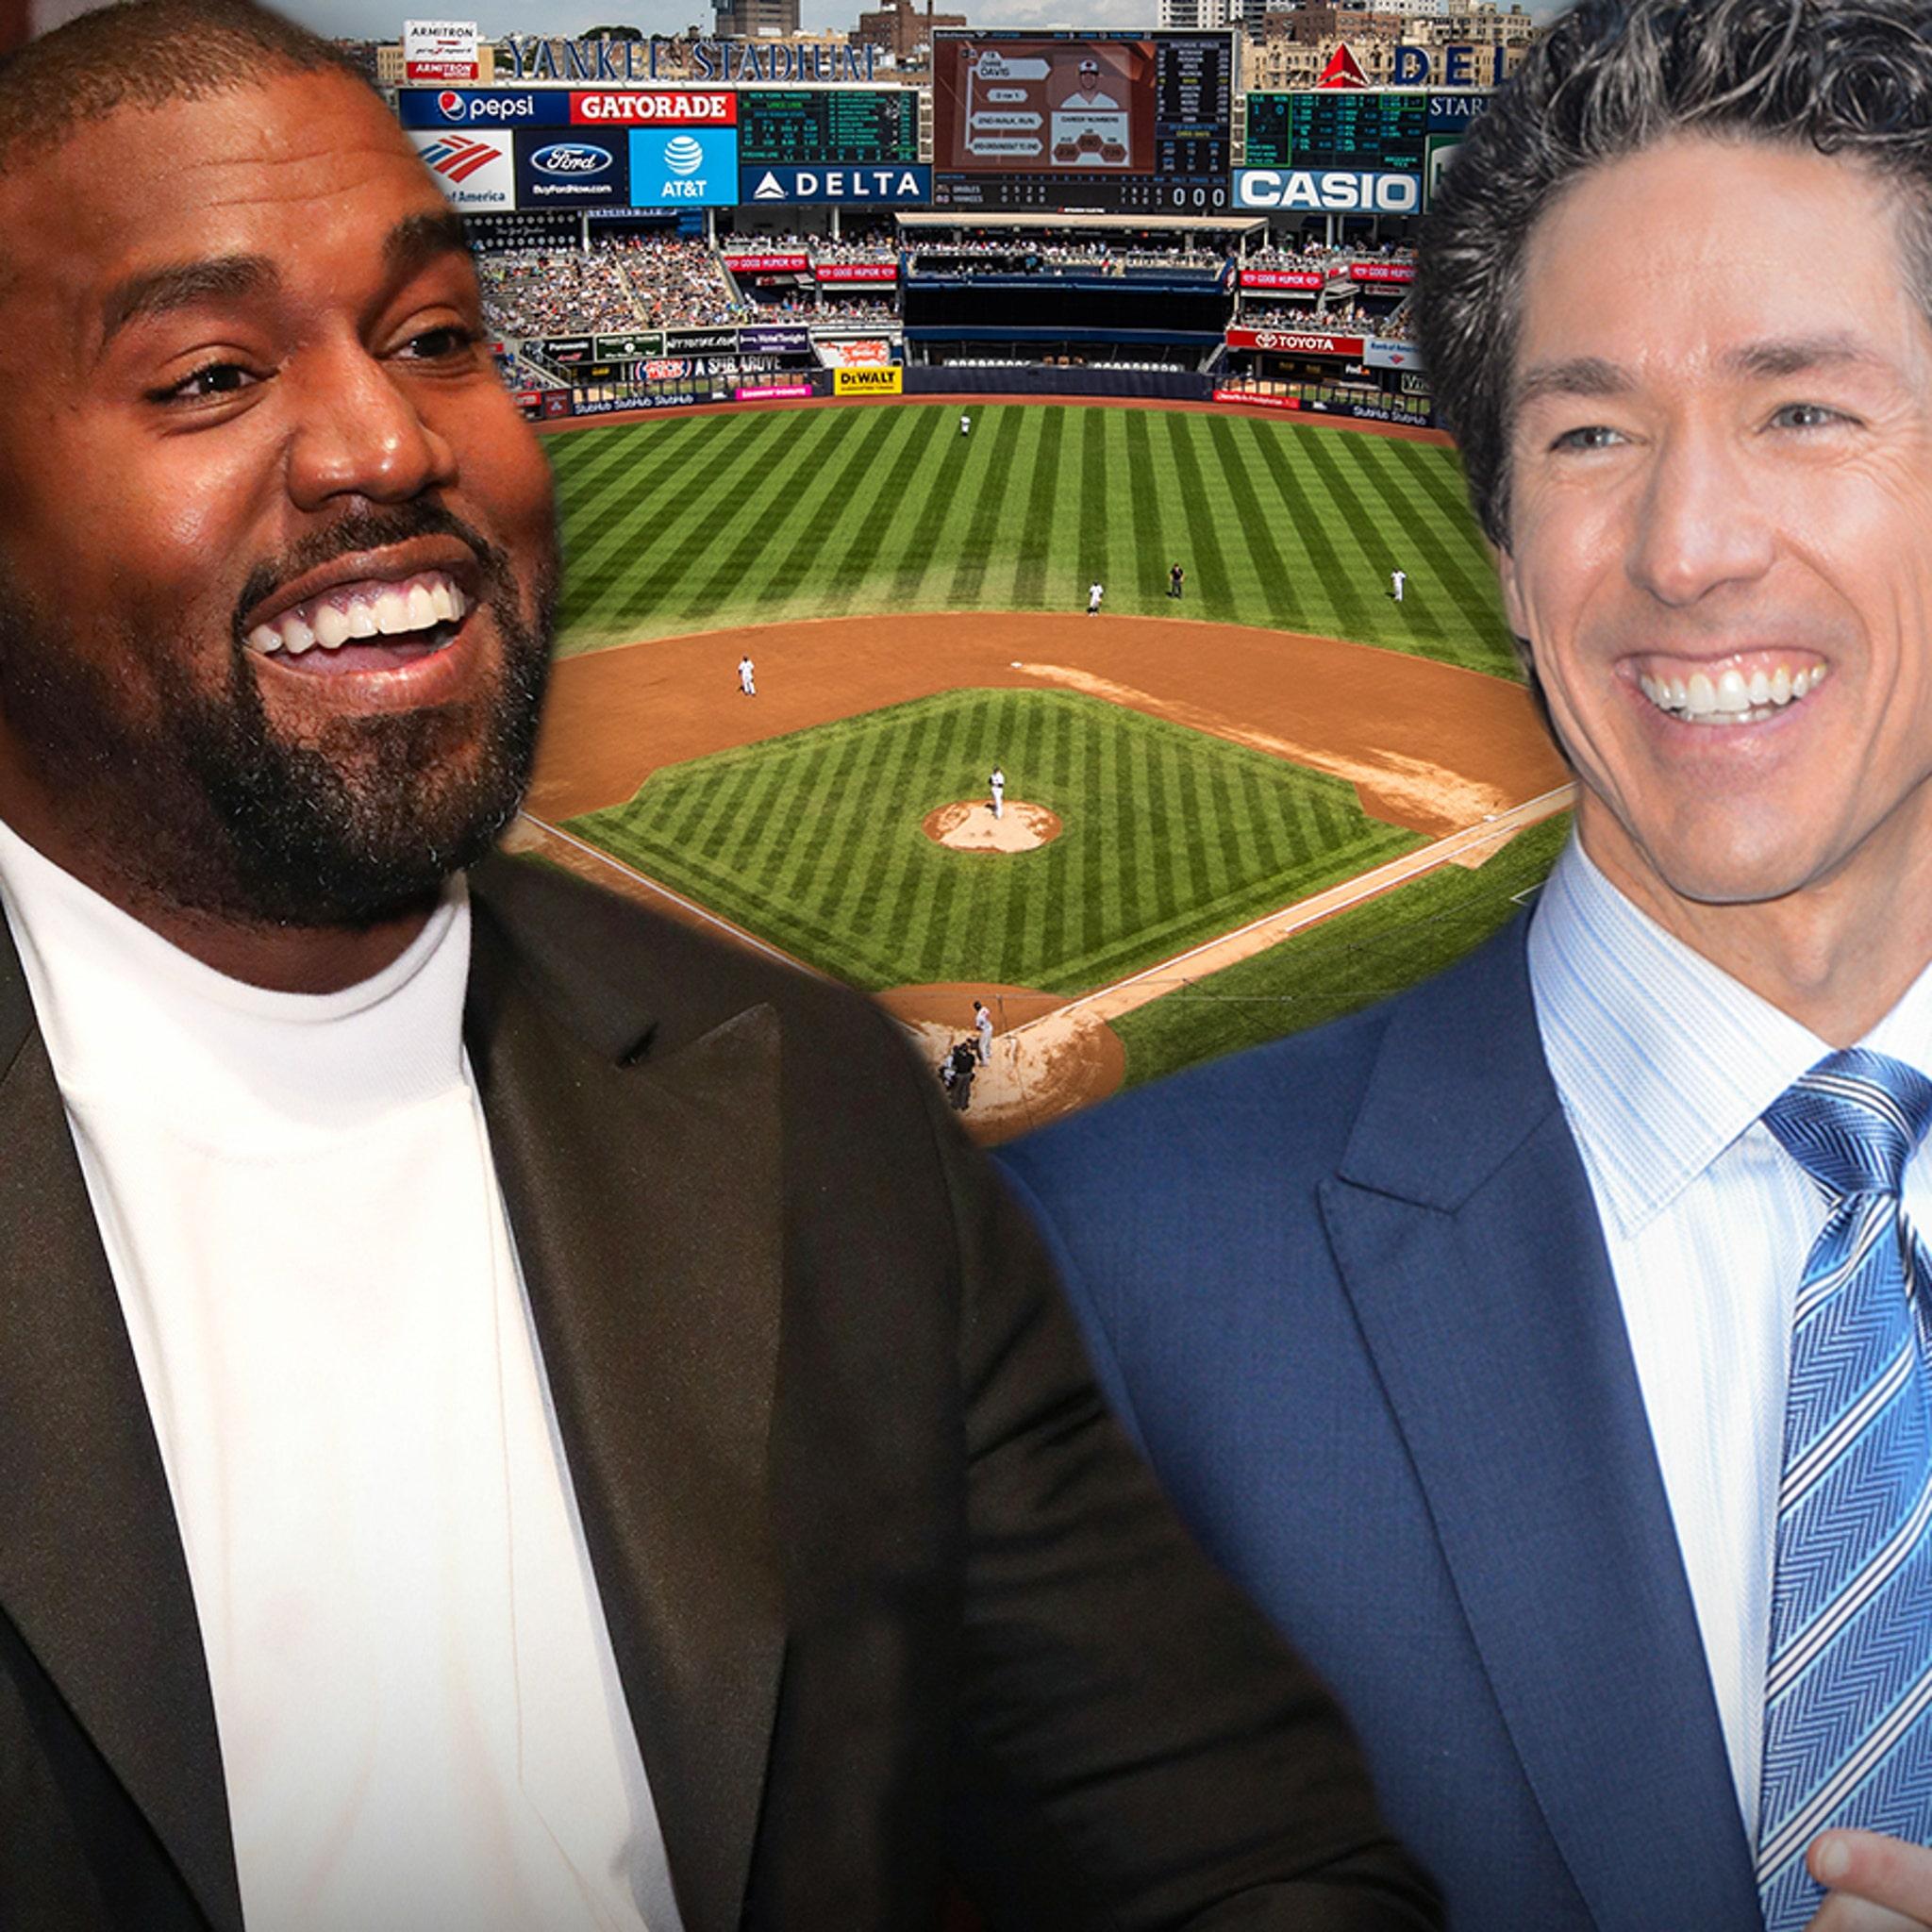 Kanye West Joining Joel Osteen for Huge Yankee Stadium 'Night of Hope'